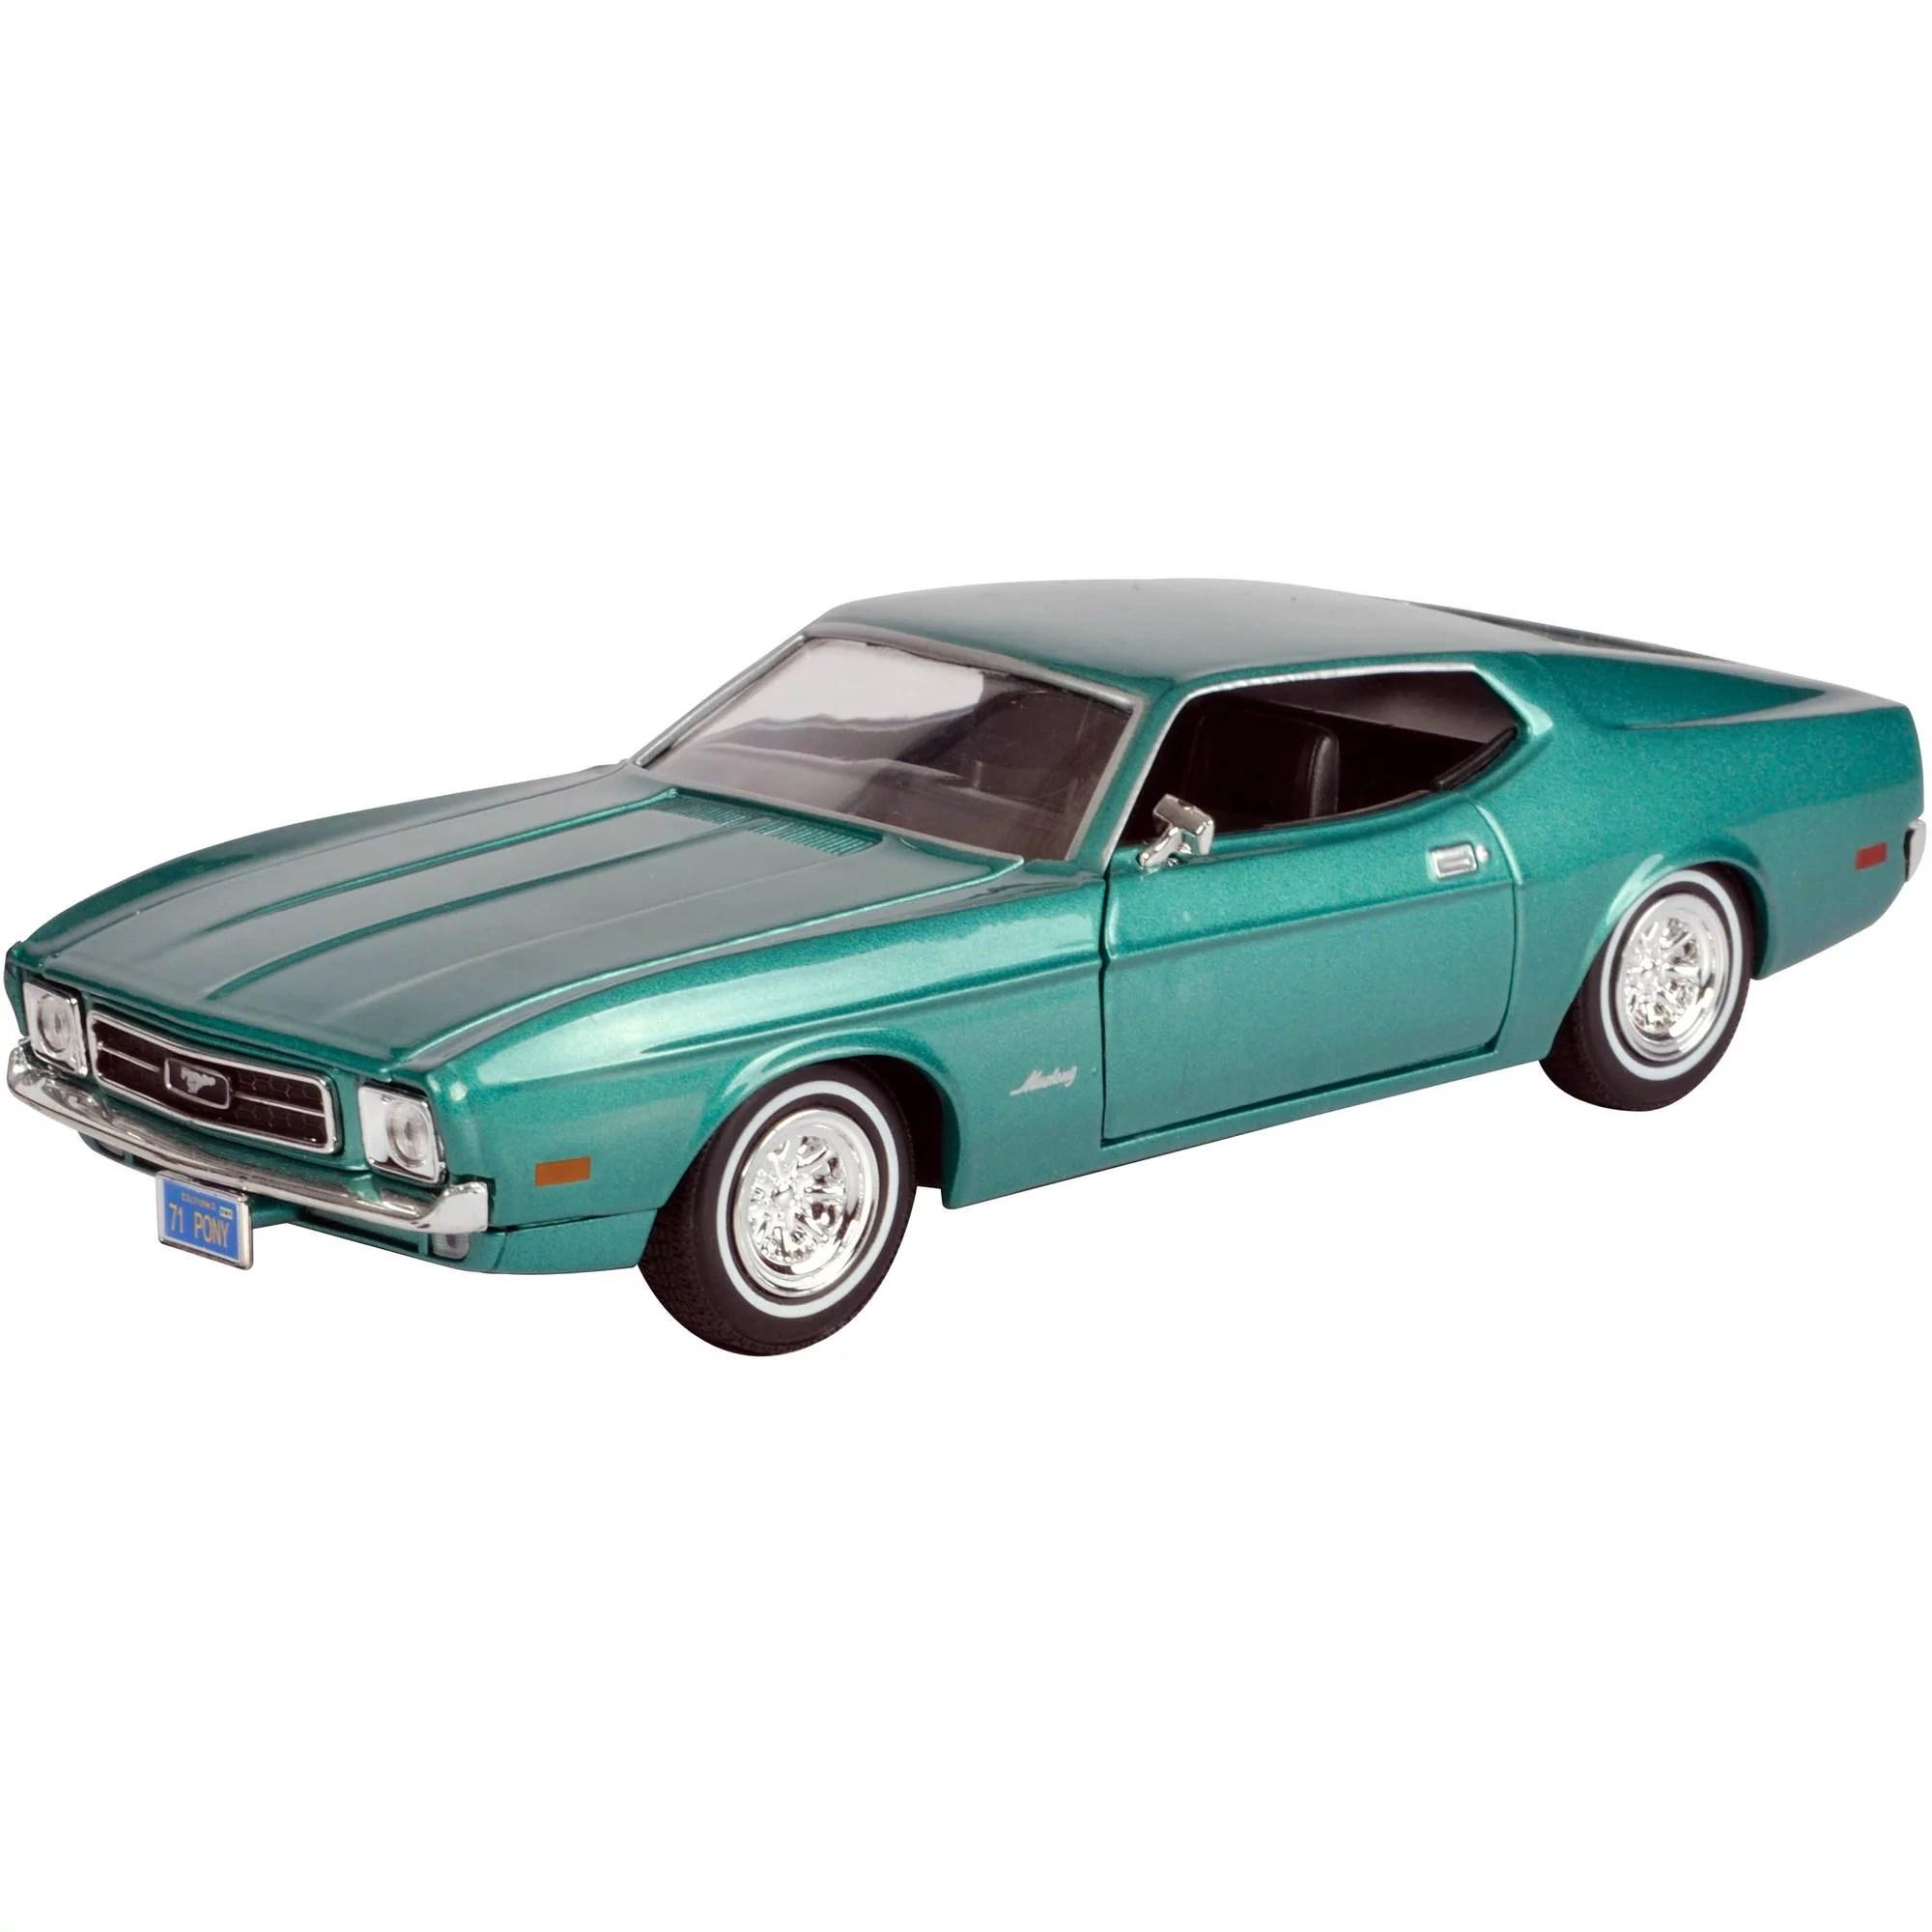 1971 Ford Mustang Sportsroof Model 1 24 Scale Walmart